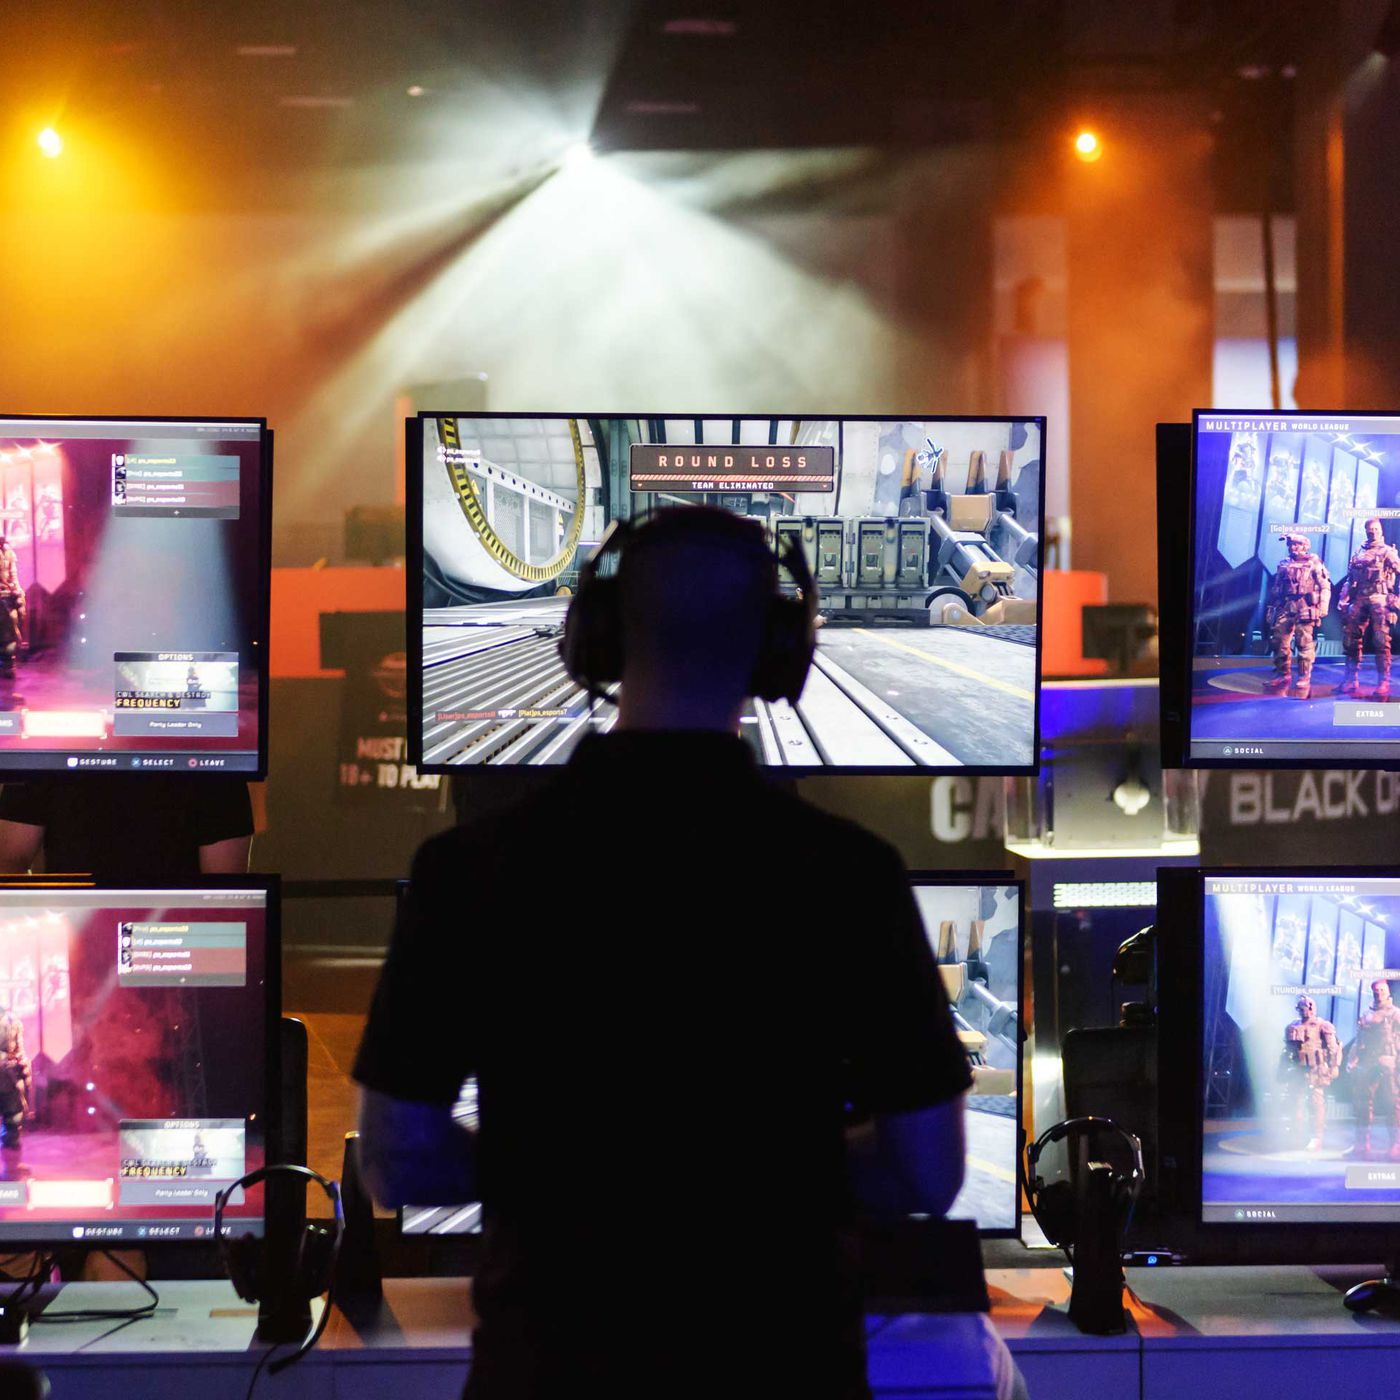 Alt Binaries Global Quake Free video games, violence, and guns: the frustrating, enduring